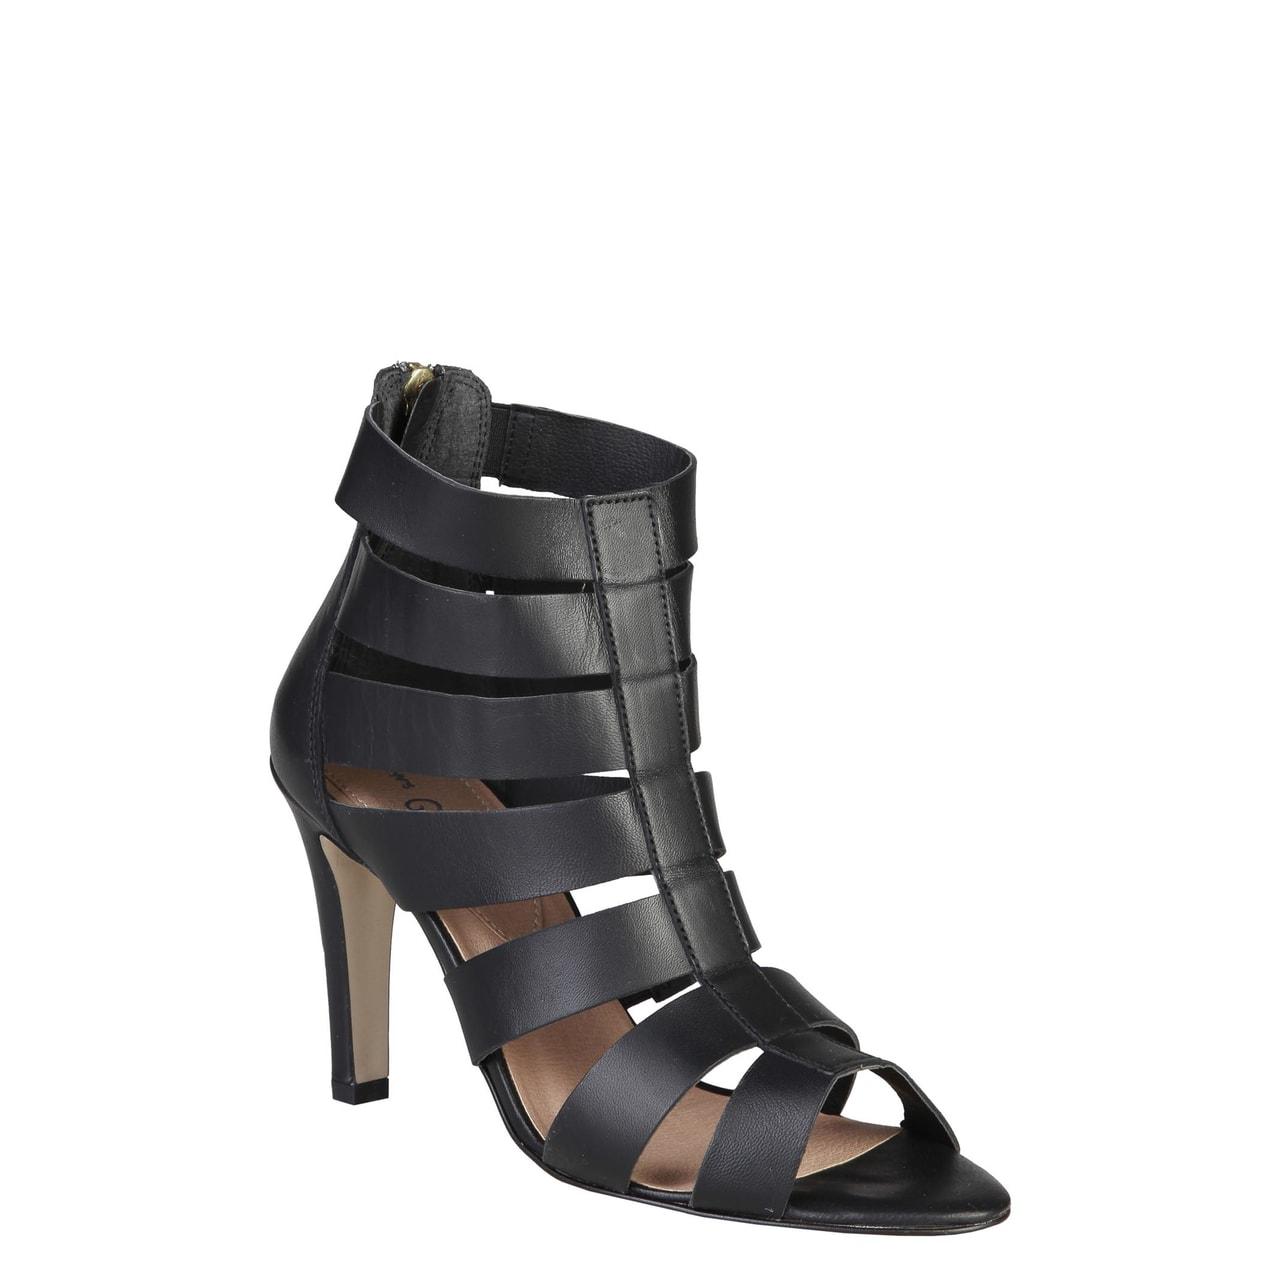 7a5a9f998627 Glamadise.sk - Dámske kožené páskové sandále čierne - Pierre Cardin ...